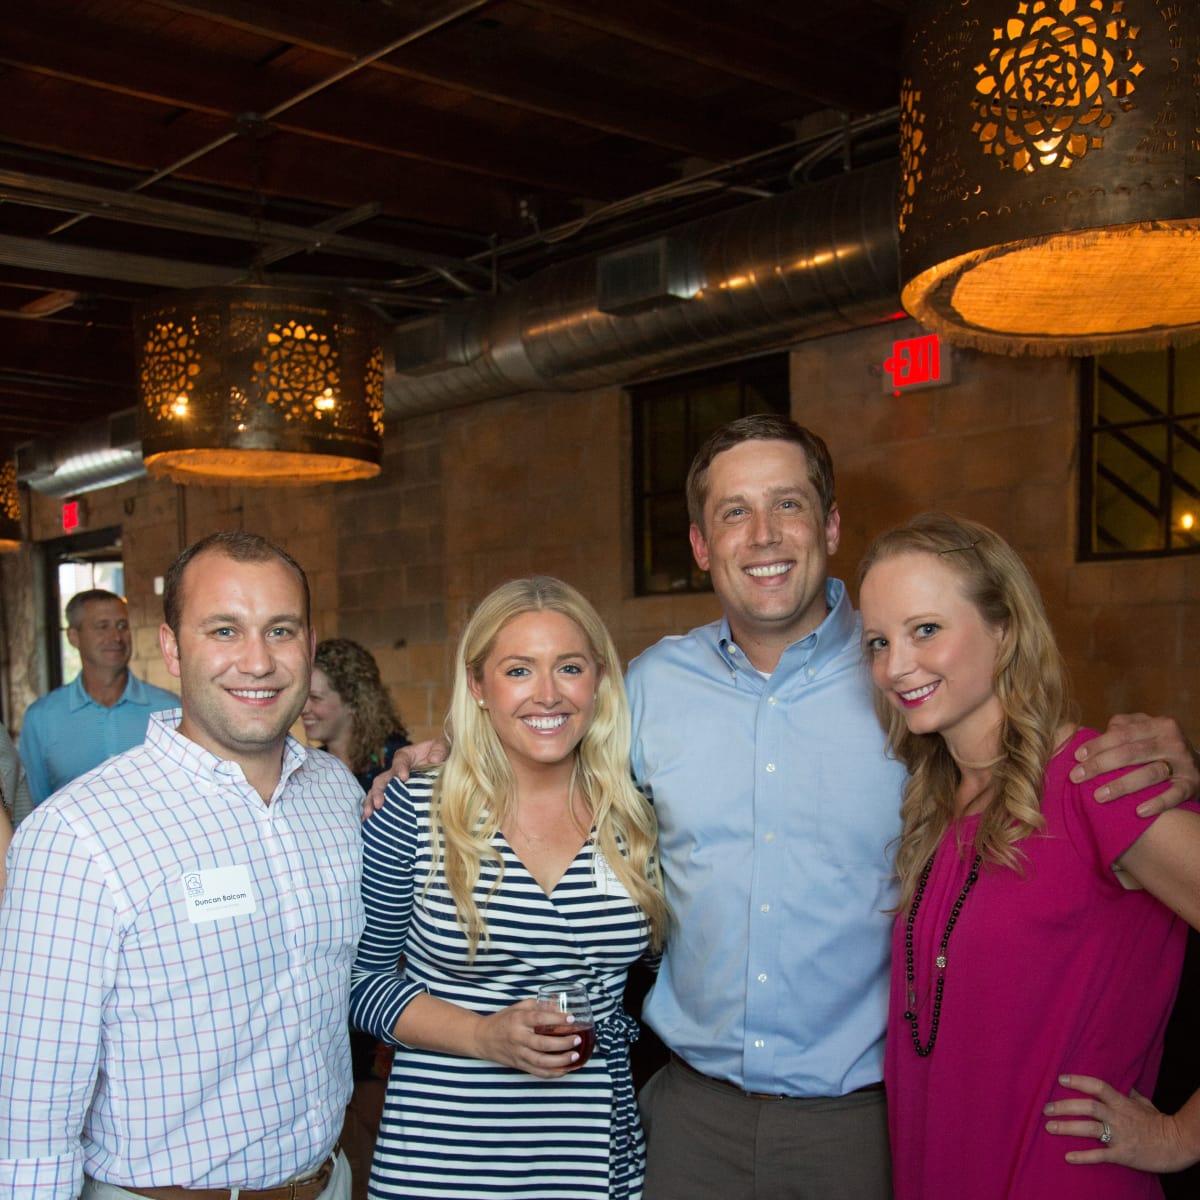 Houston, Casa de Esperanza YP Happy Hour, September 2015, Duncan Balcom, Jordan Balcom, Chris Manuel, Katie Manuel.